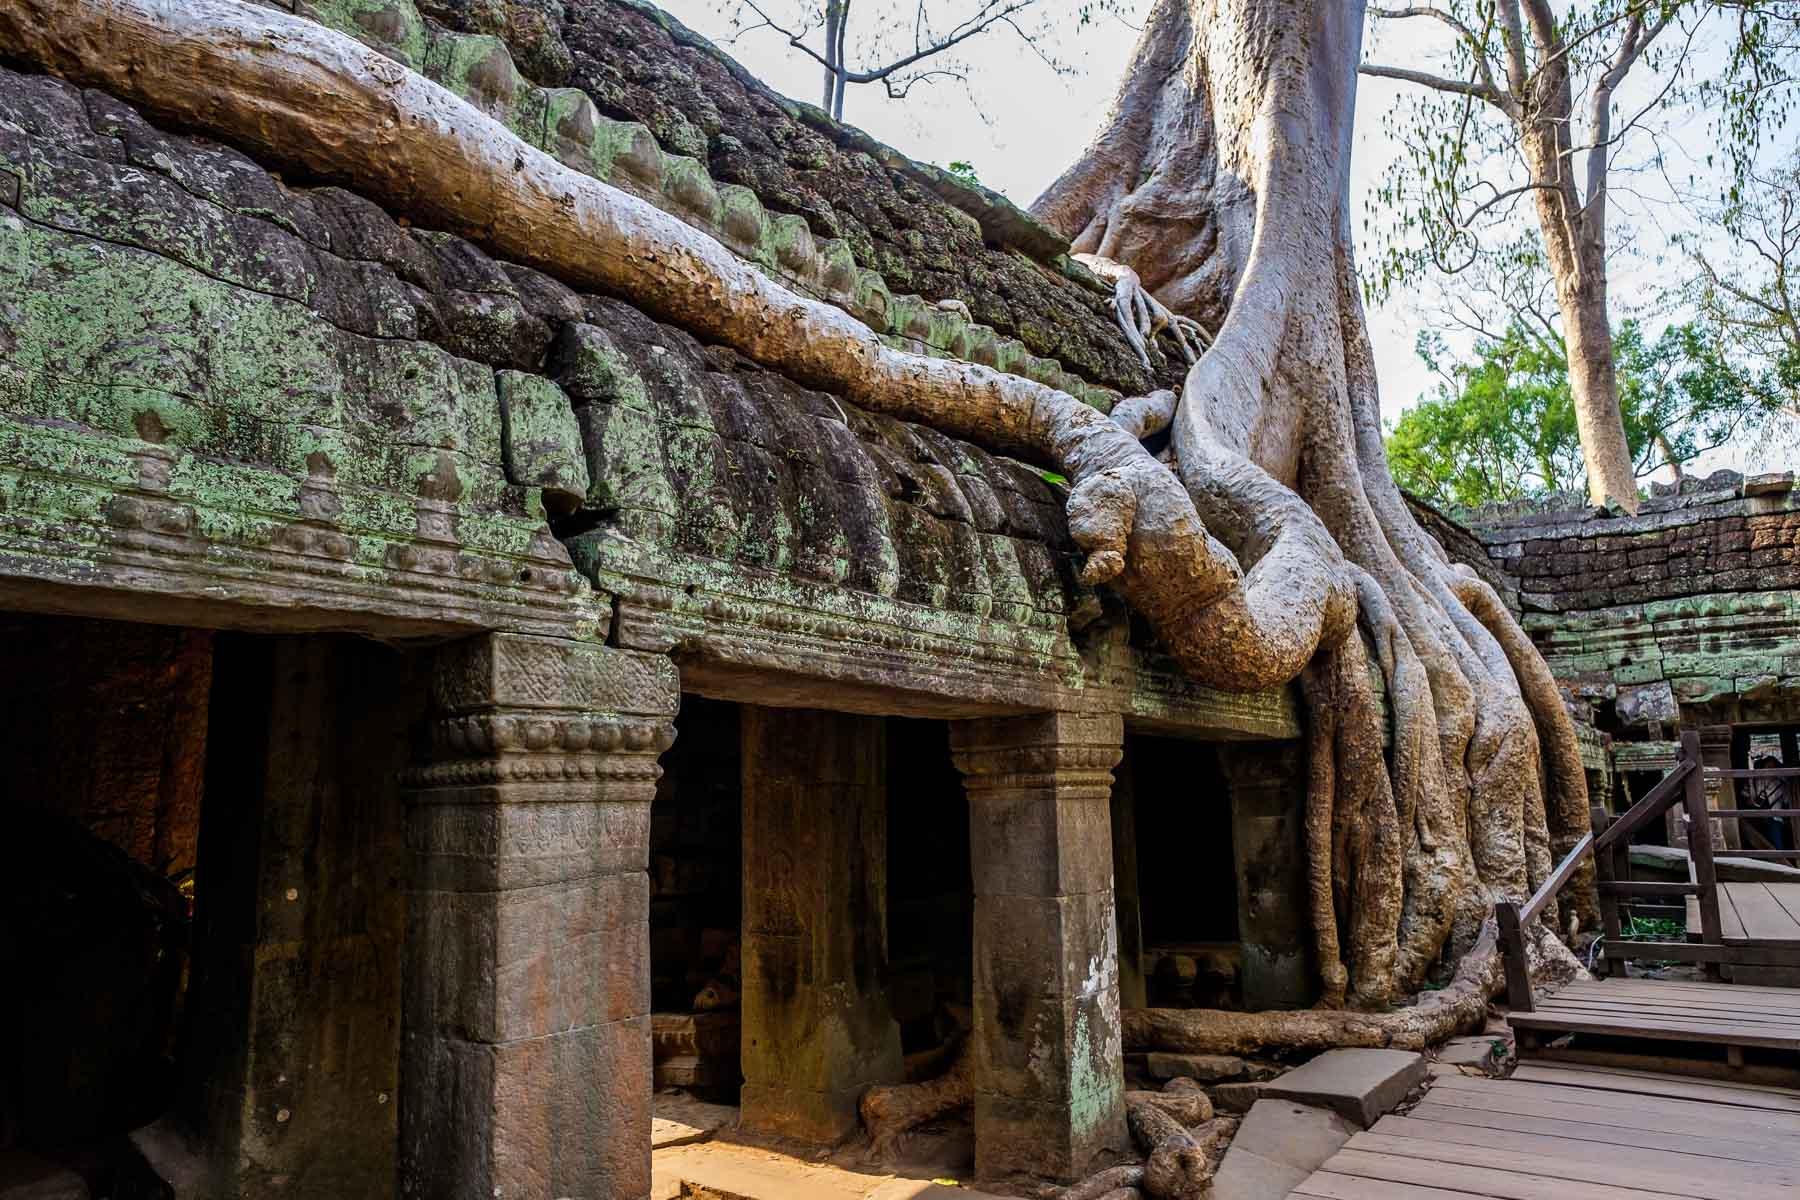 Tree root Ankor Thom